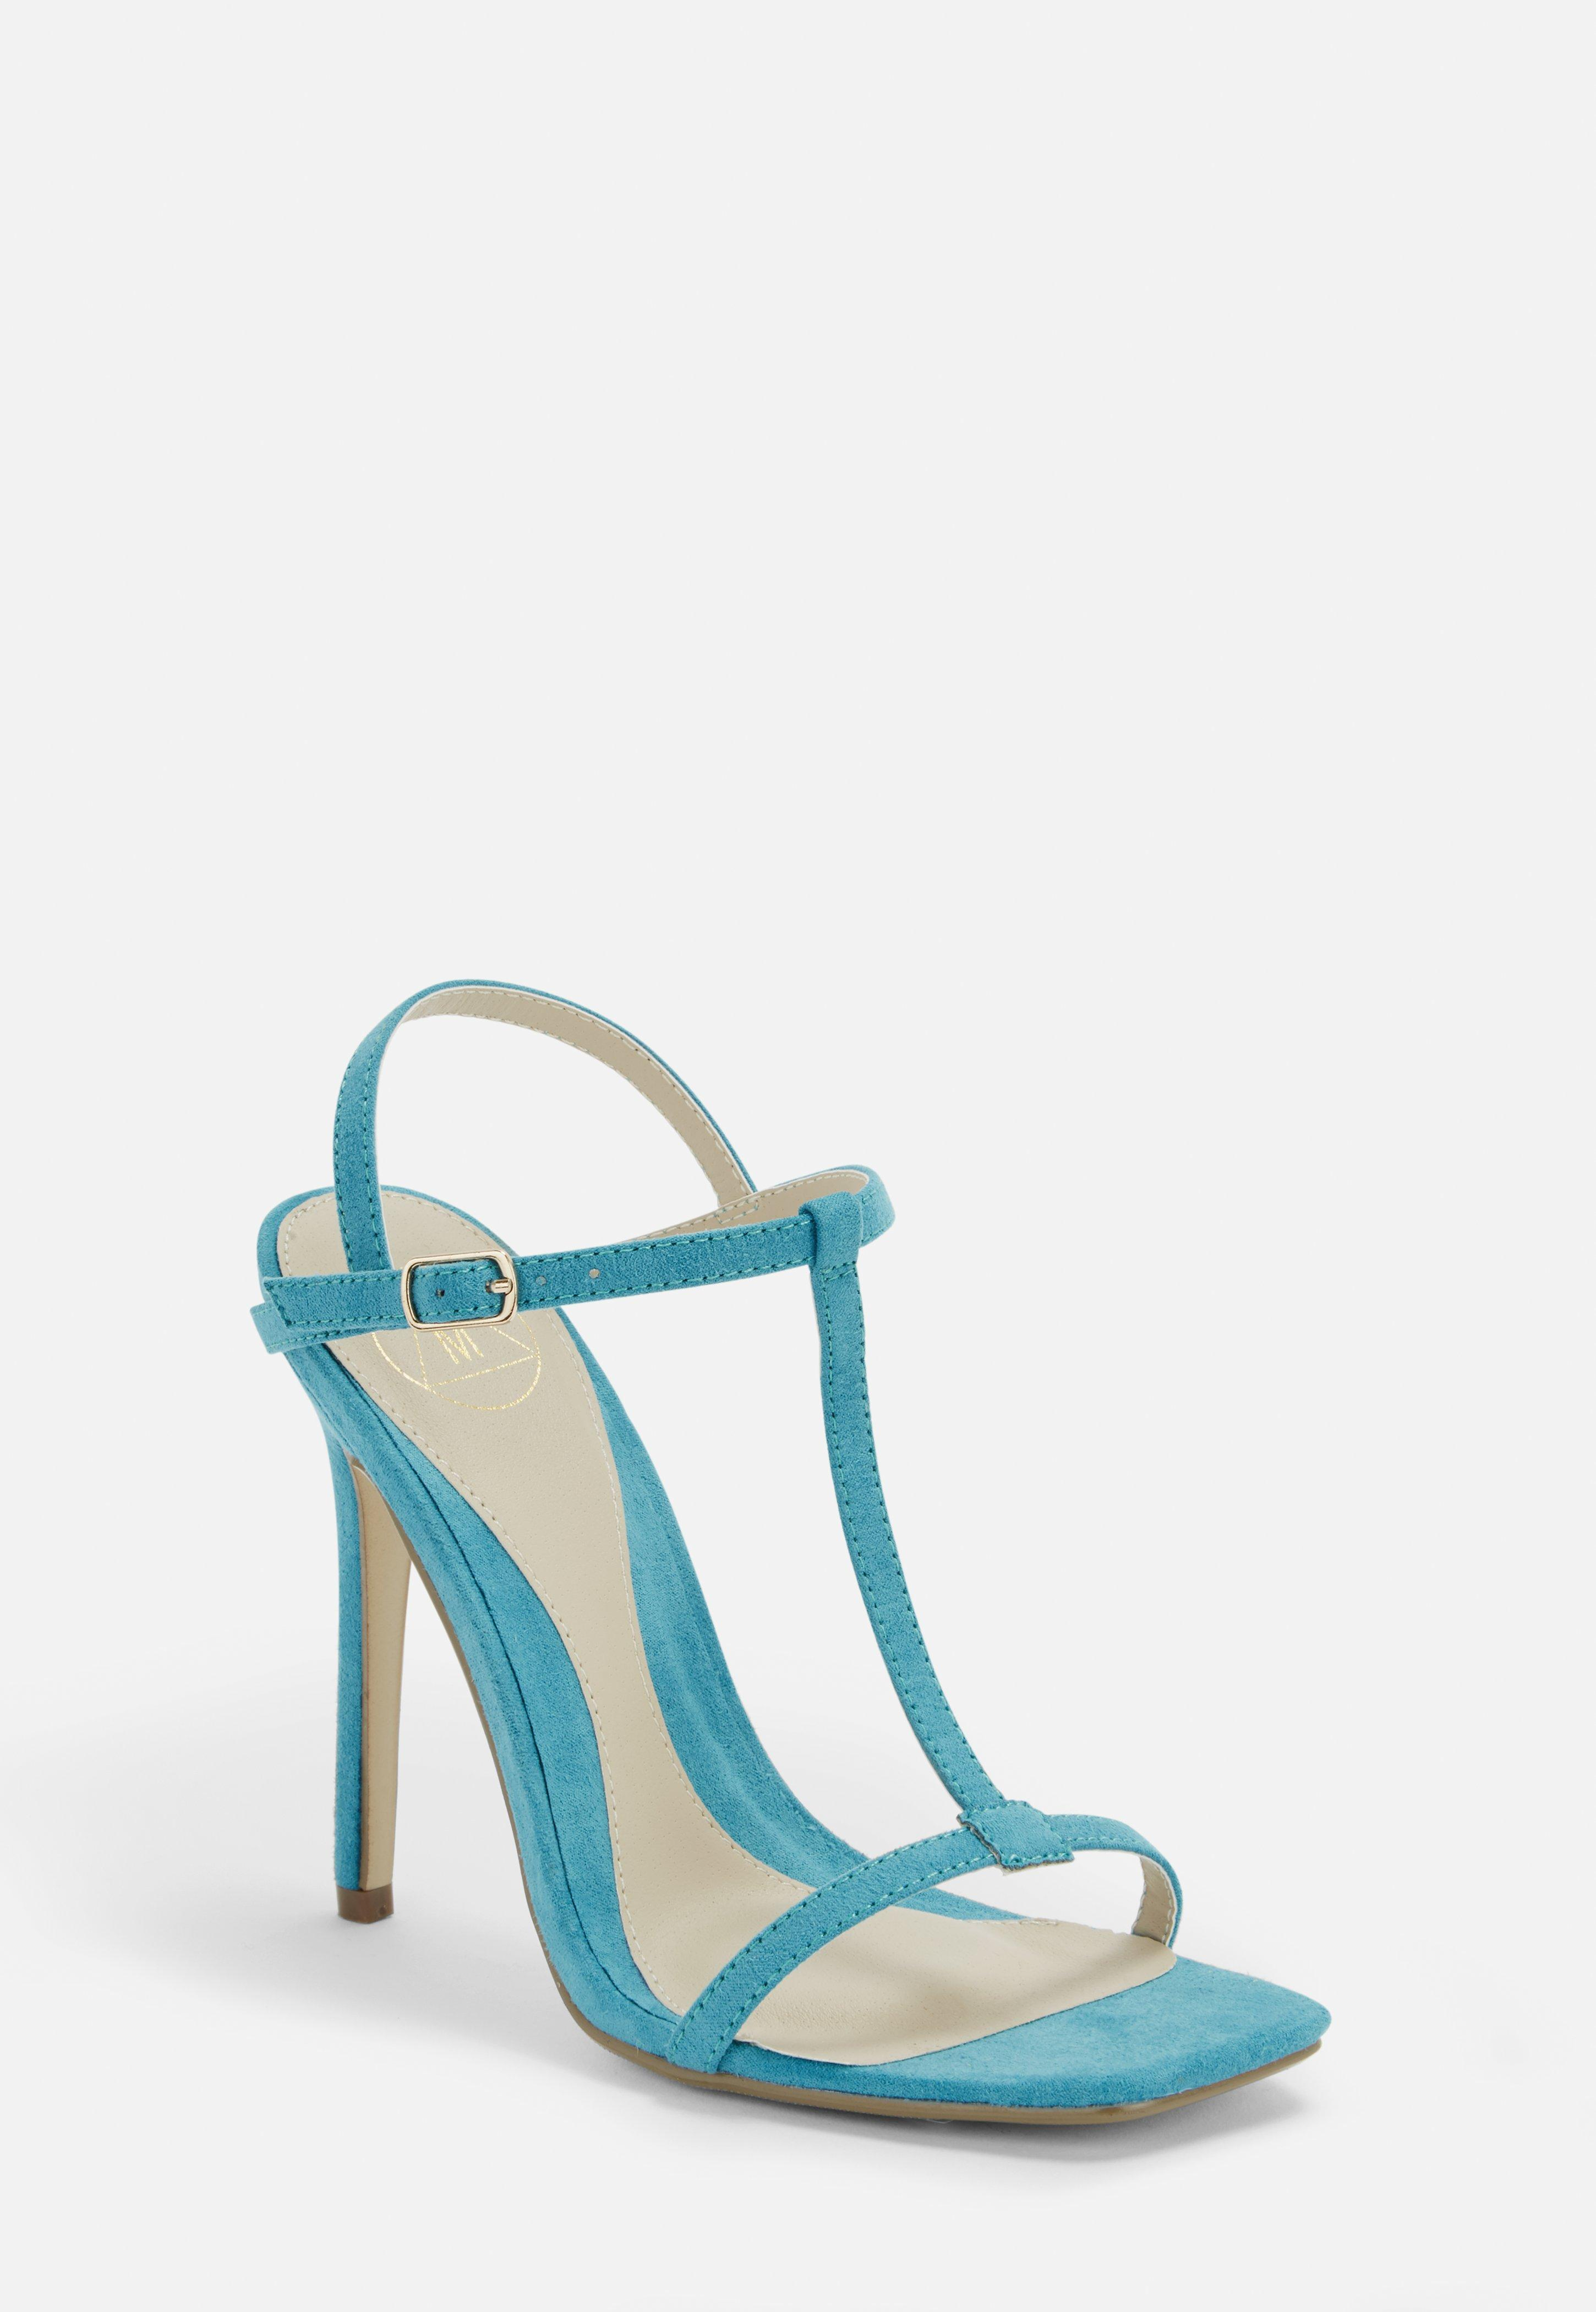 8af2e355fc1 High Heels - Shop Women s Stilettos Online